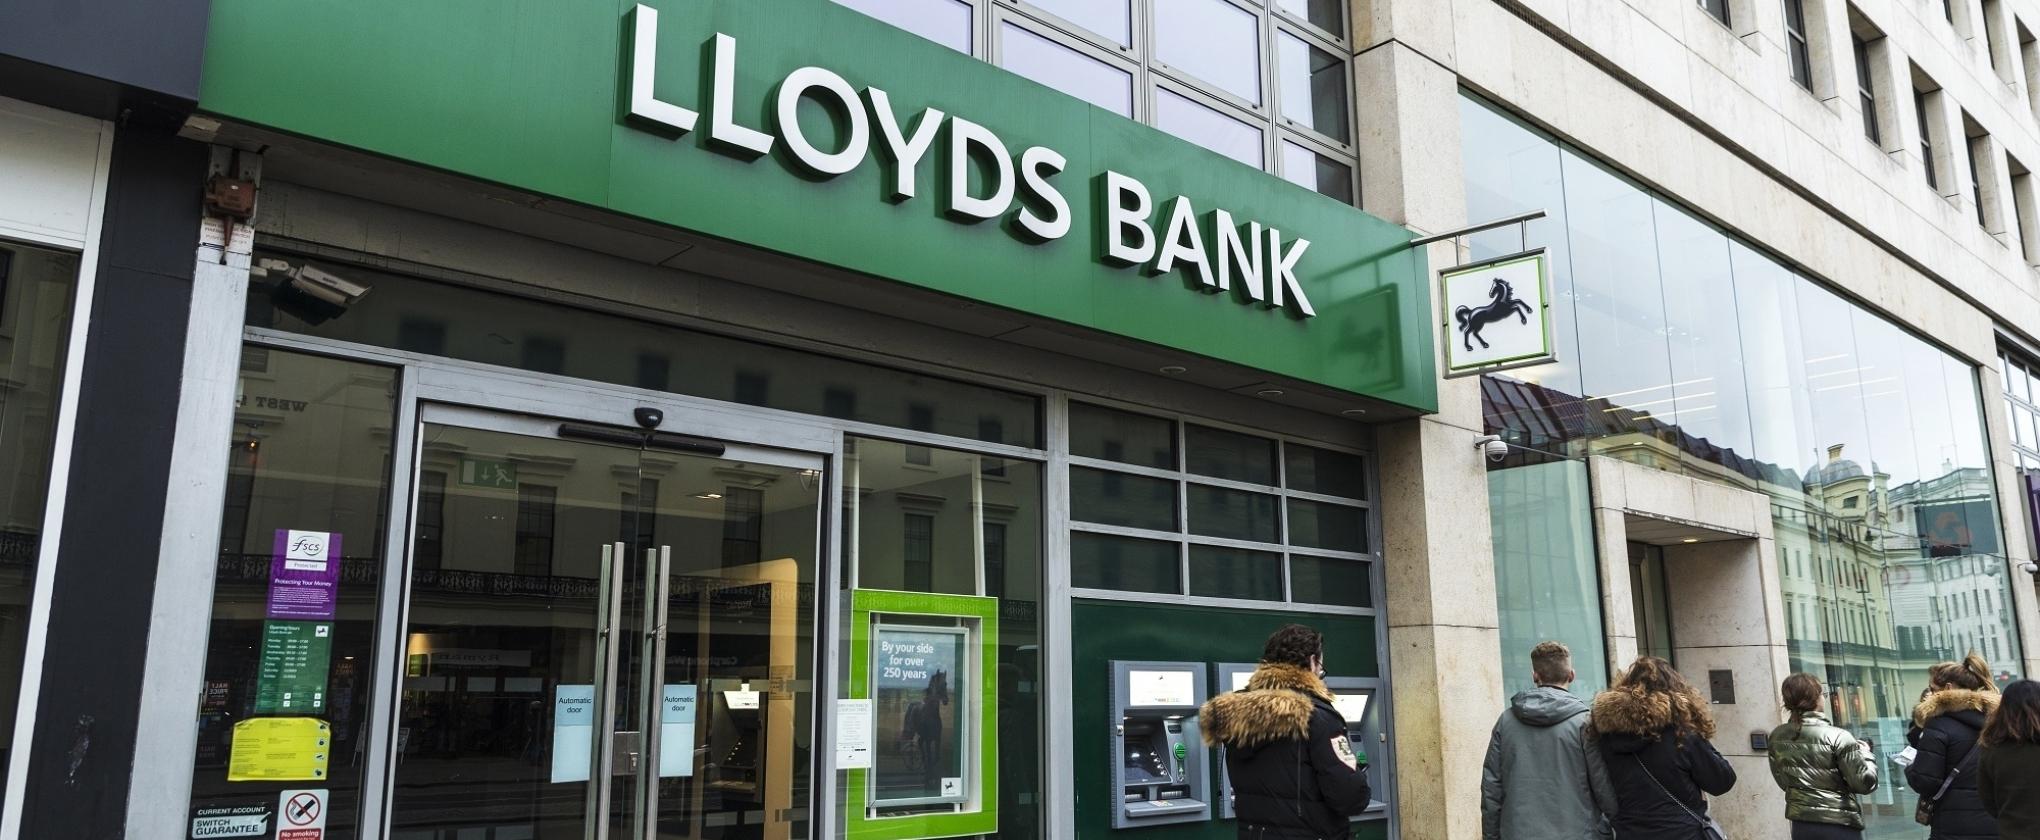 eBay Loans and Advice for eBay Seller Success